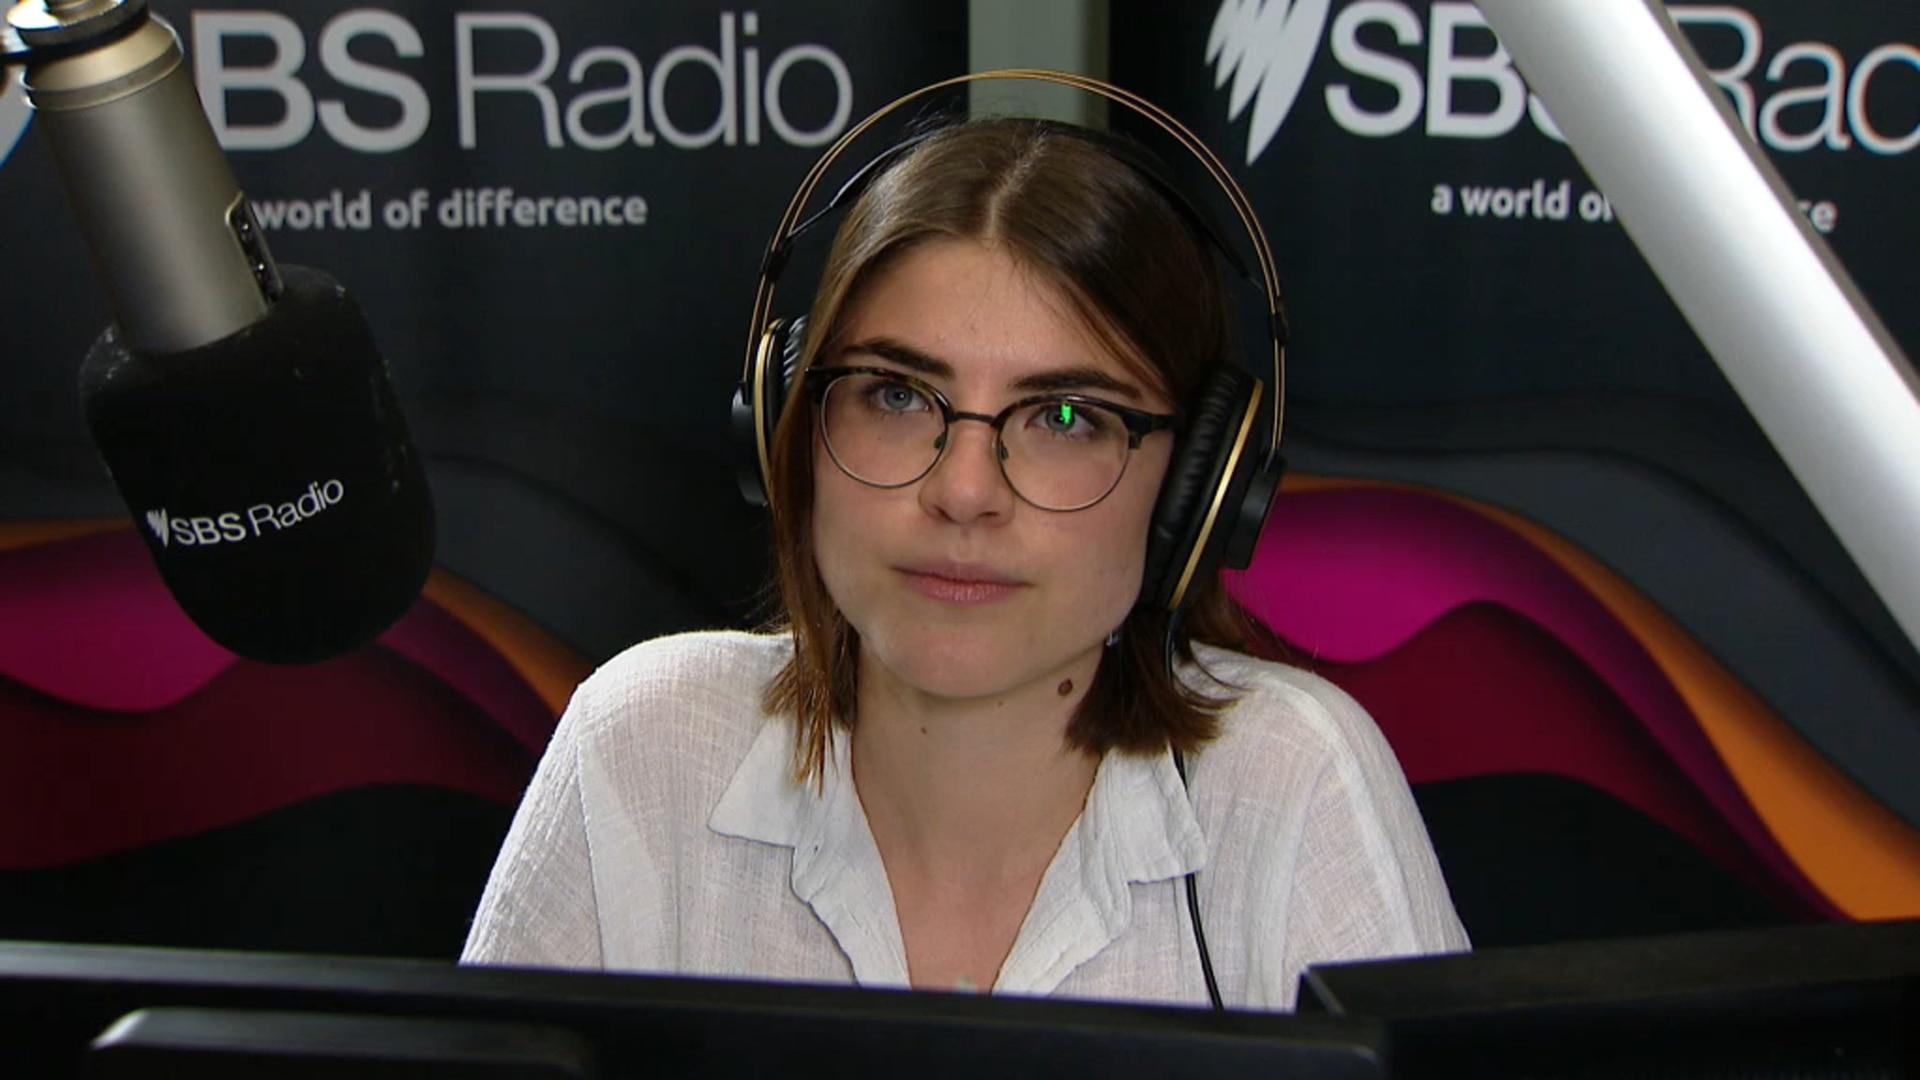 SBS Serbian's Sofija Petrovic has translated the statement.